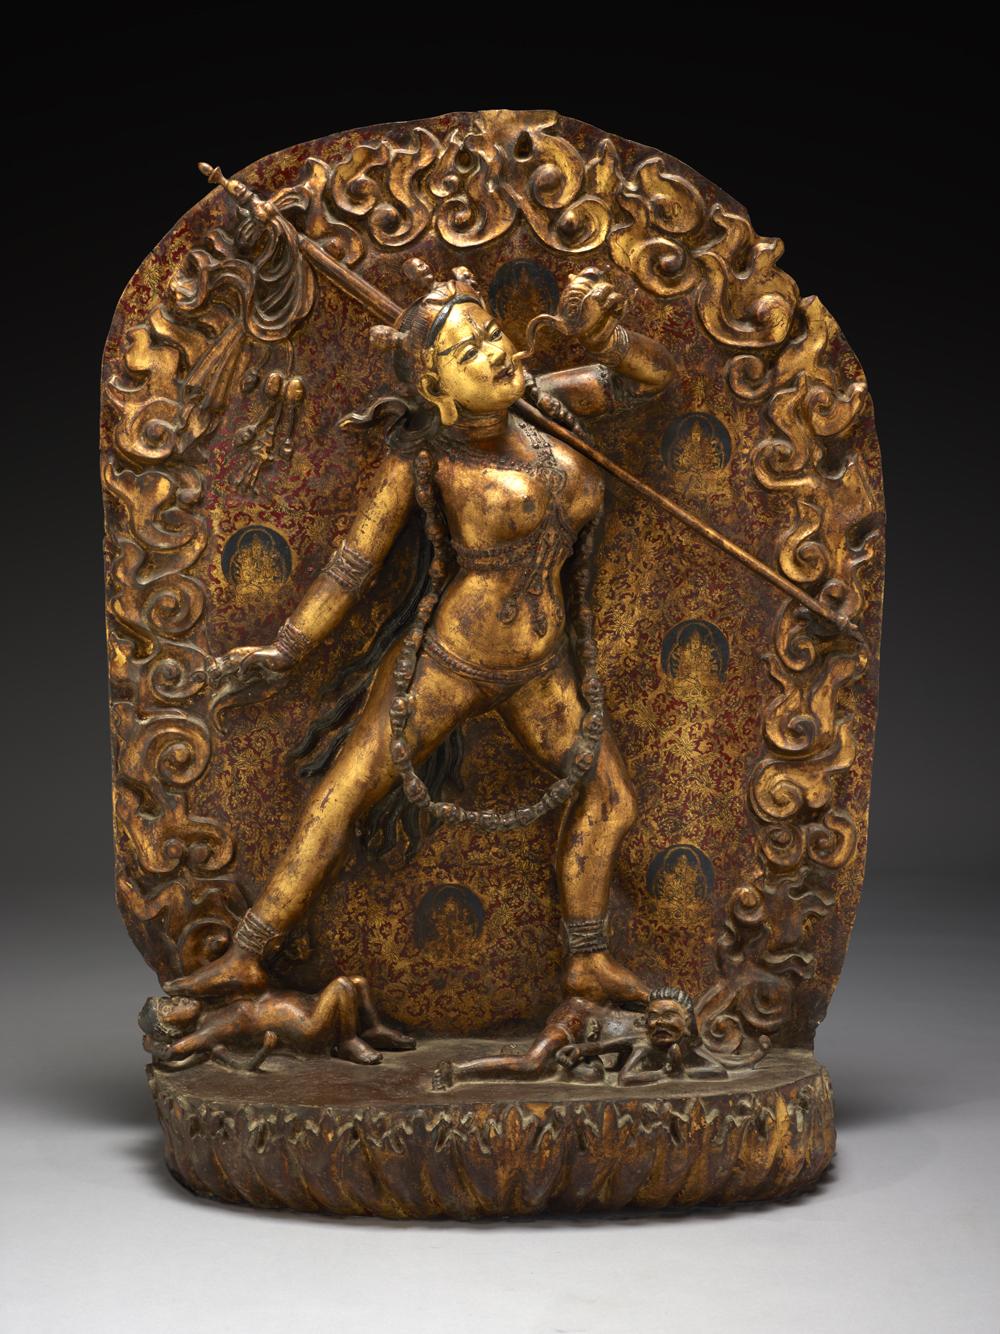 Sarva Buddha Dakini, Sino-Tibetan culture, early 19th century, Courtesy of The Crow Collection of Asian Art